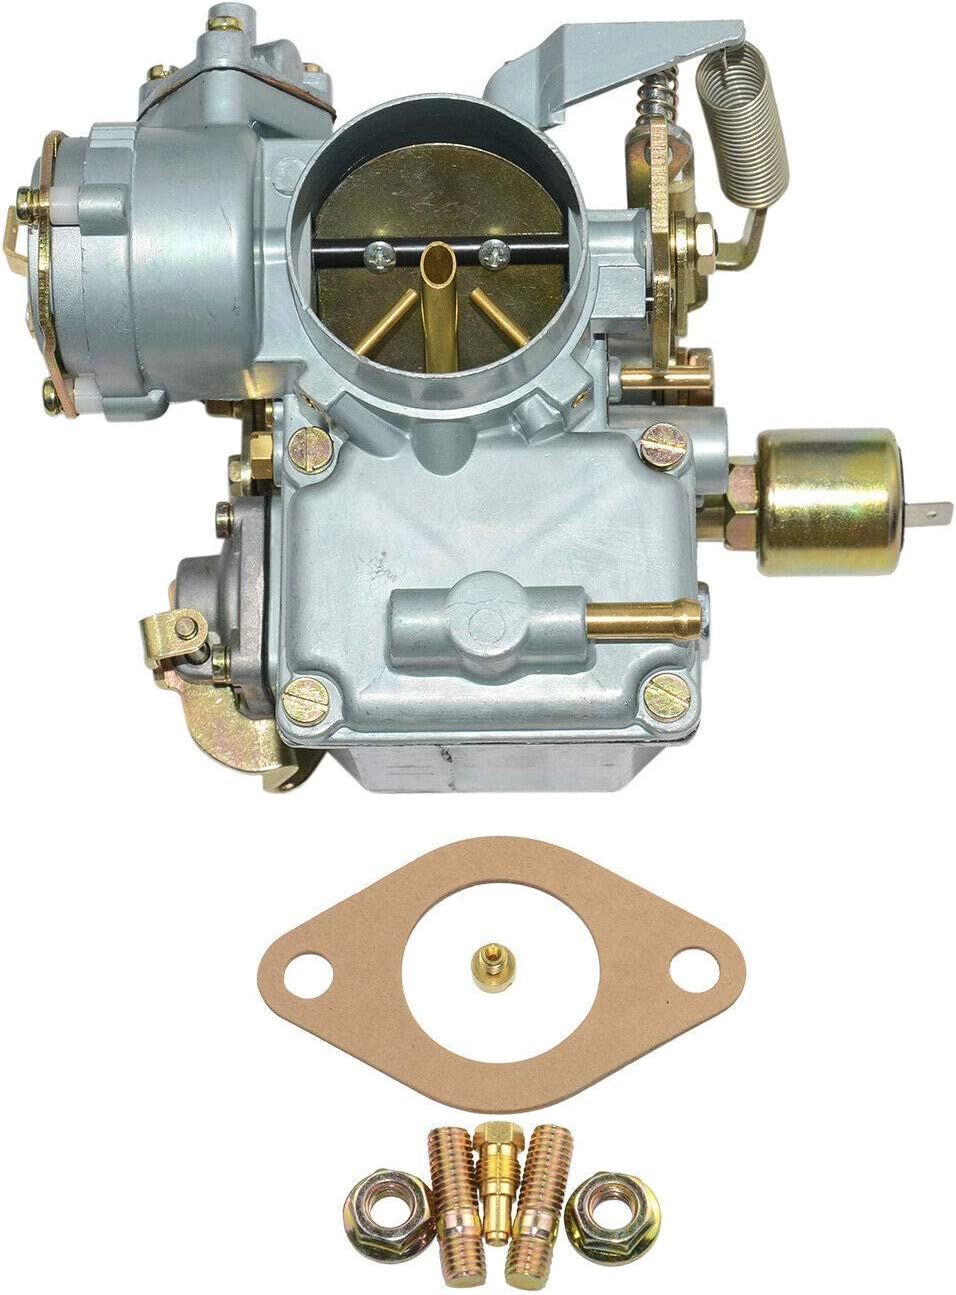 Nrpfell Carburatore per Auto 34 Carburatore PICT-3 12V Elettrico per Beetle 113129031K